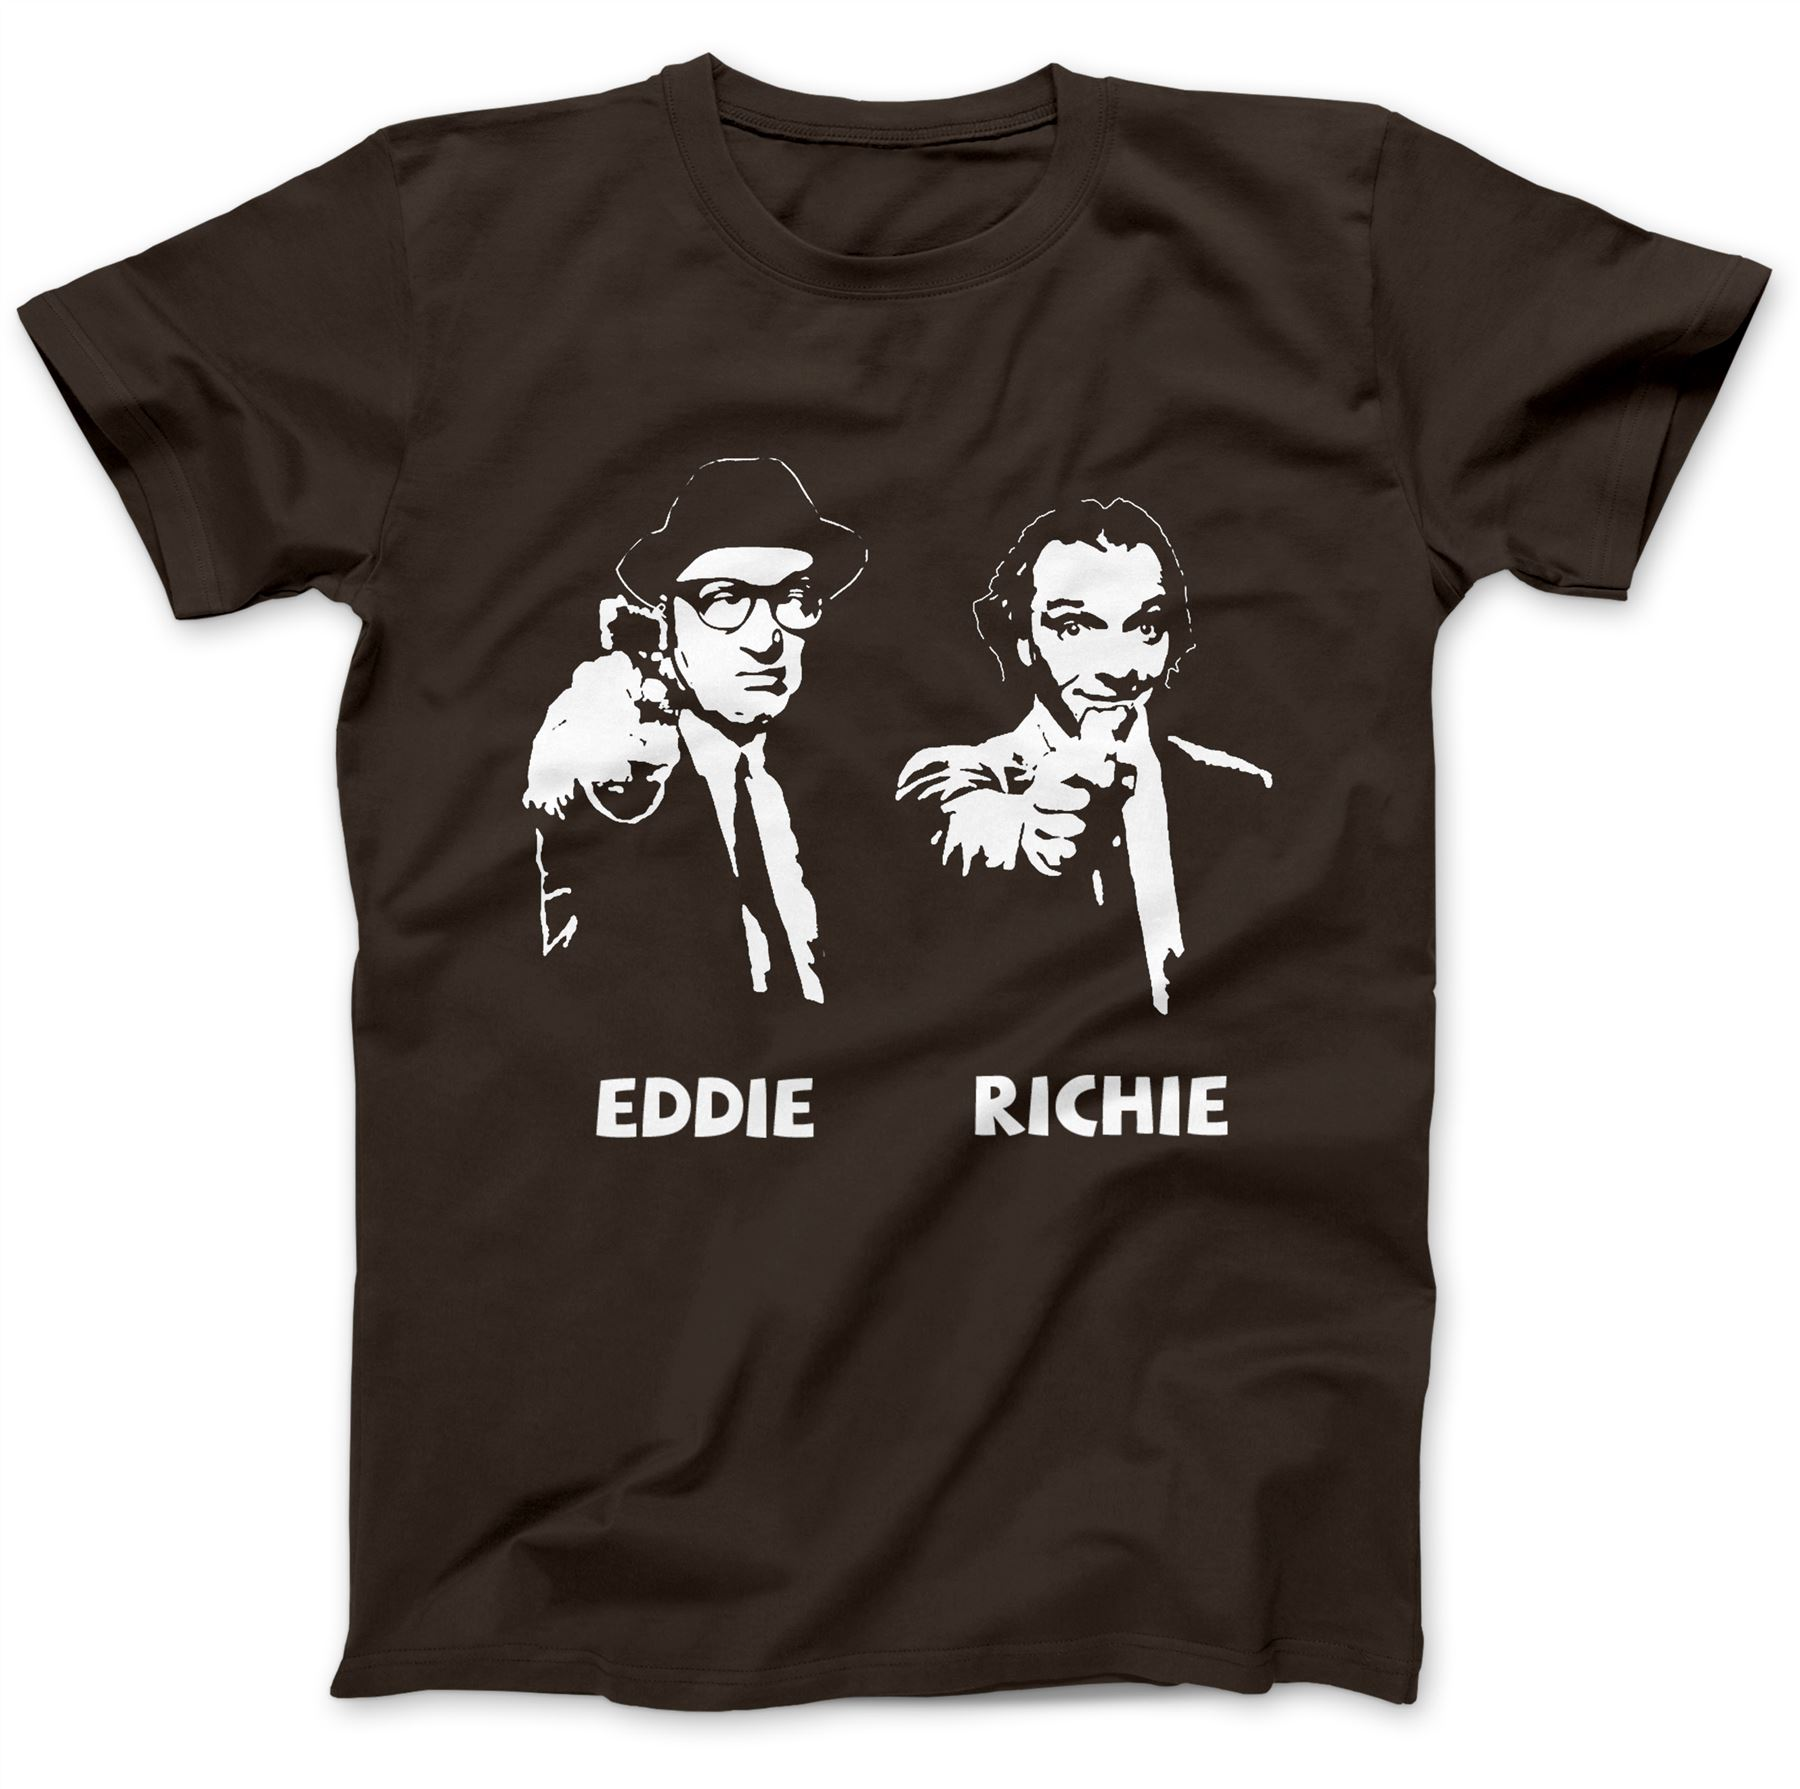 Camiseta inspirada en inferior 100/% Algodón Premium Rik Mayall ADE Edmondson